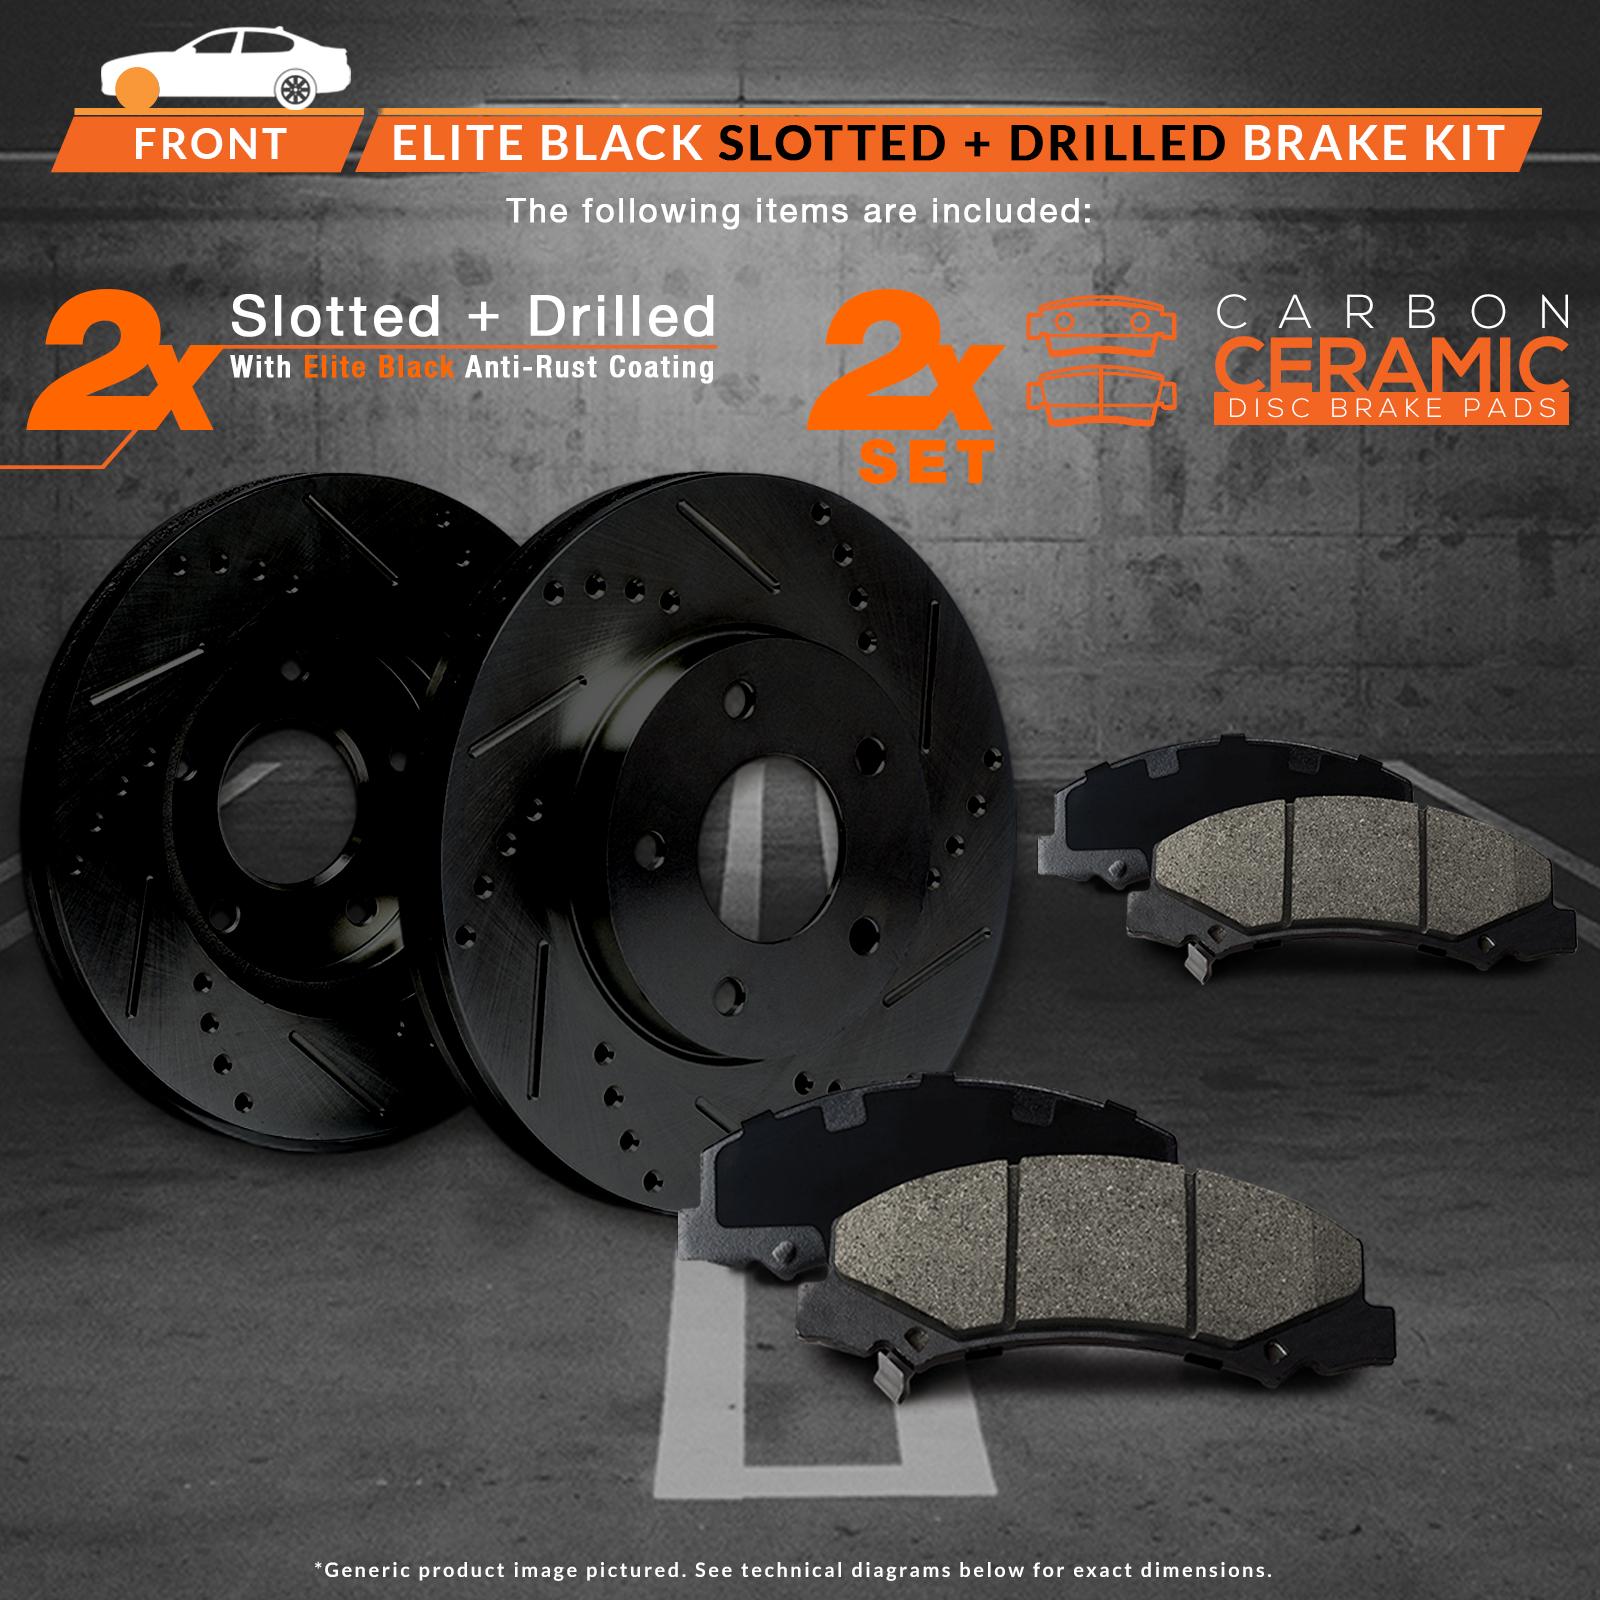 Max Brakes Front Elite E-Coated XDS Rotors and Ceramic Pads Brake Kit KT098781-7